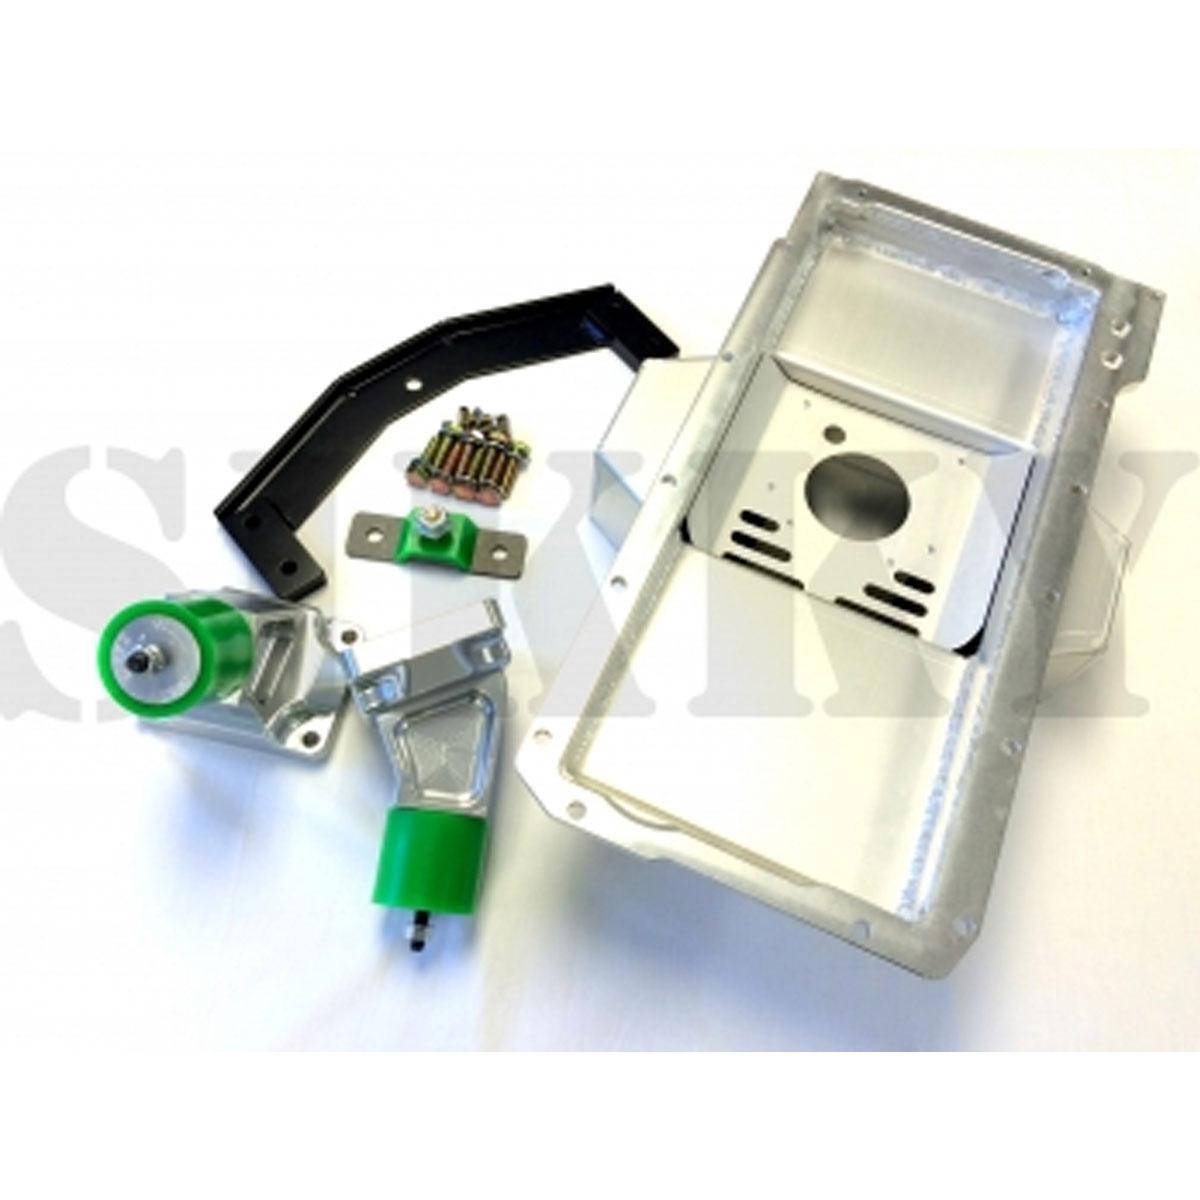 Details about Sikky Stage 1 LS Swap Mount Kit Aluminum Driveshaft for Lexus  SC300 & SC400